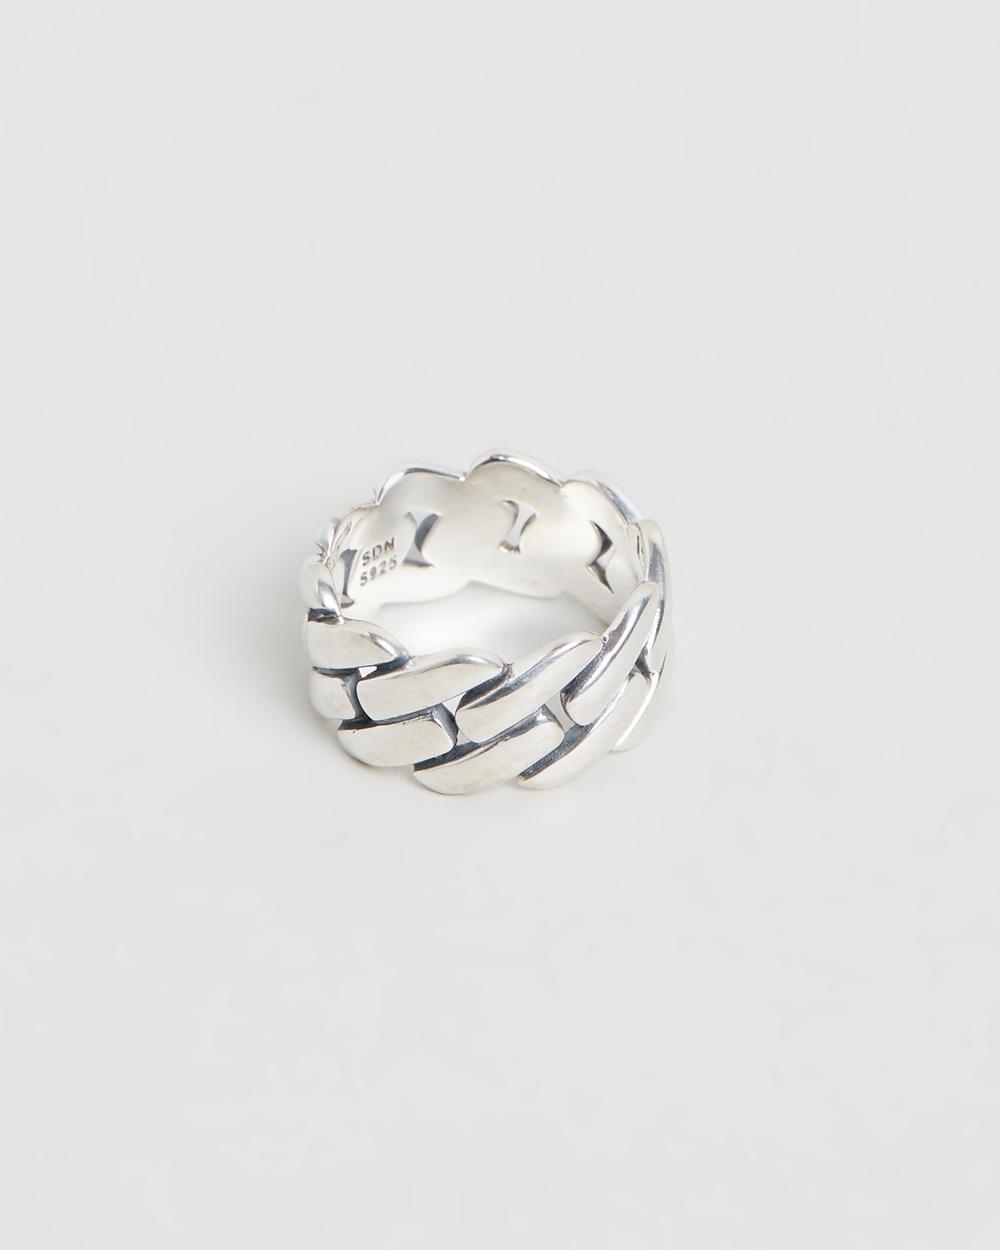 Serge DeNimes Link Ring Jewellery Silver